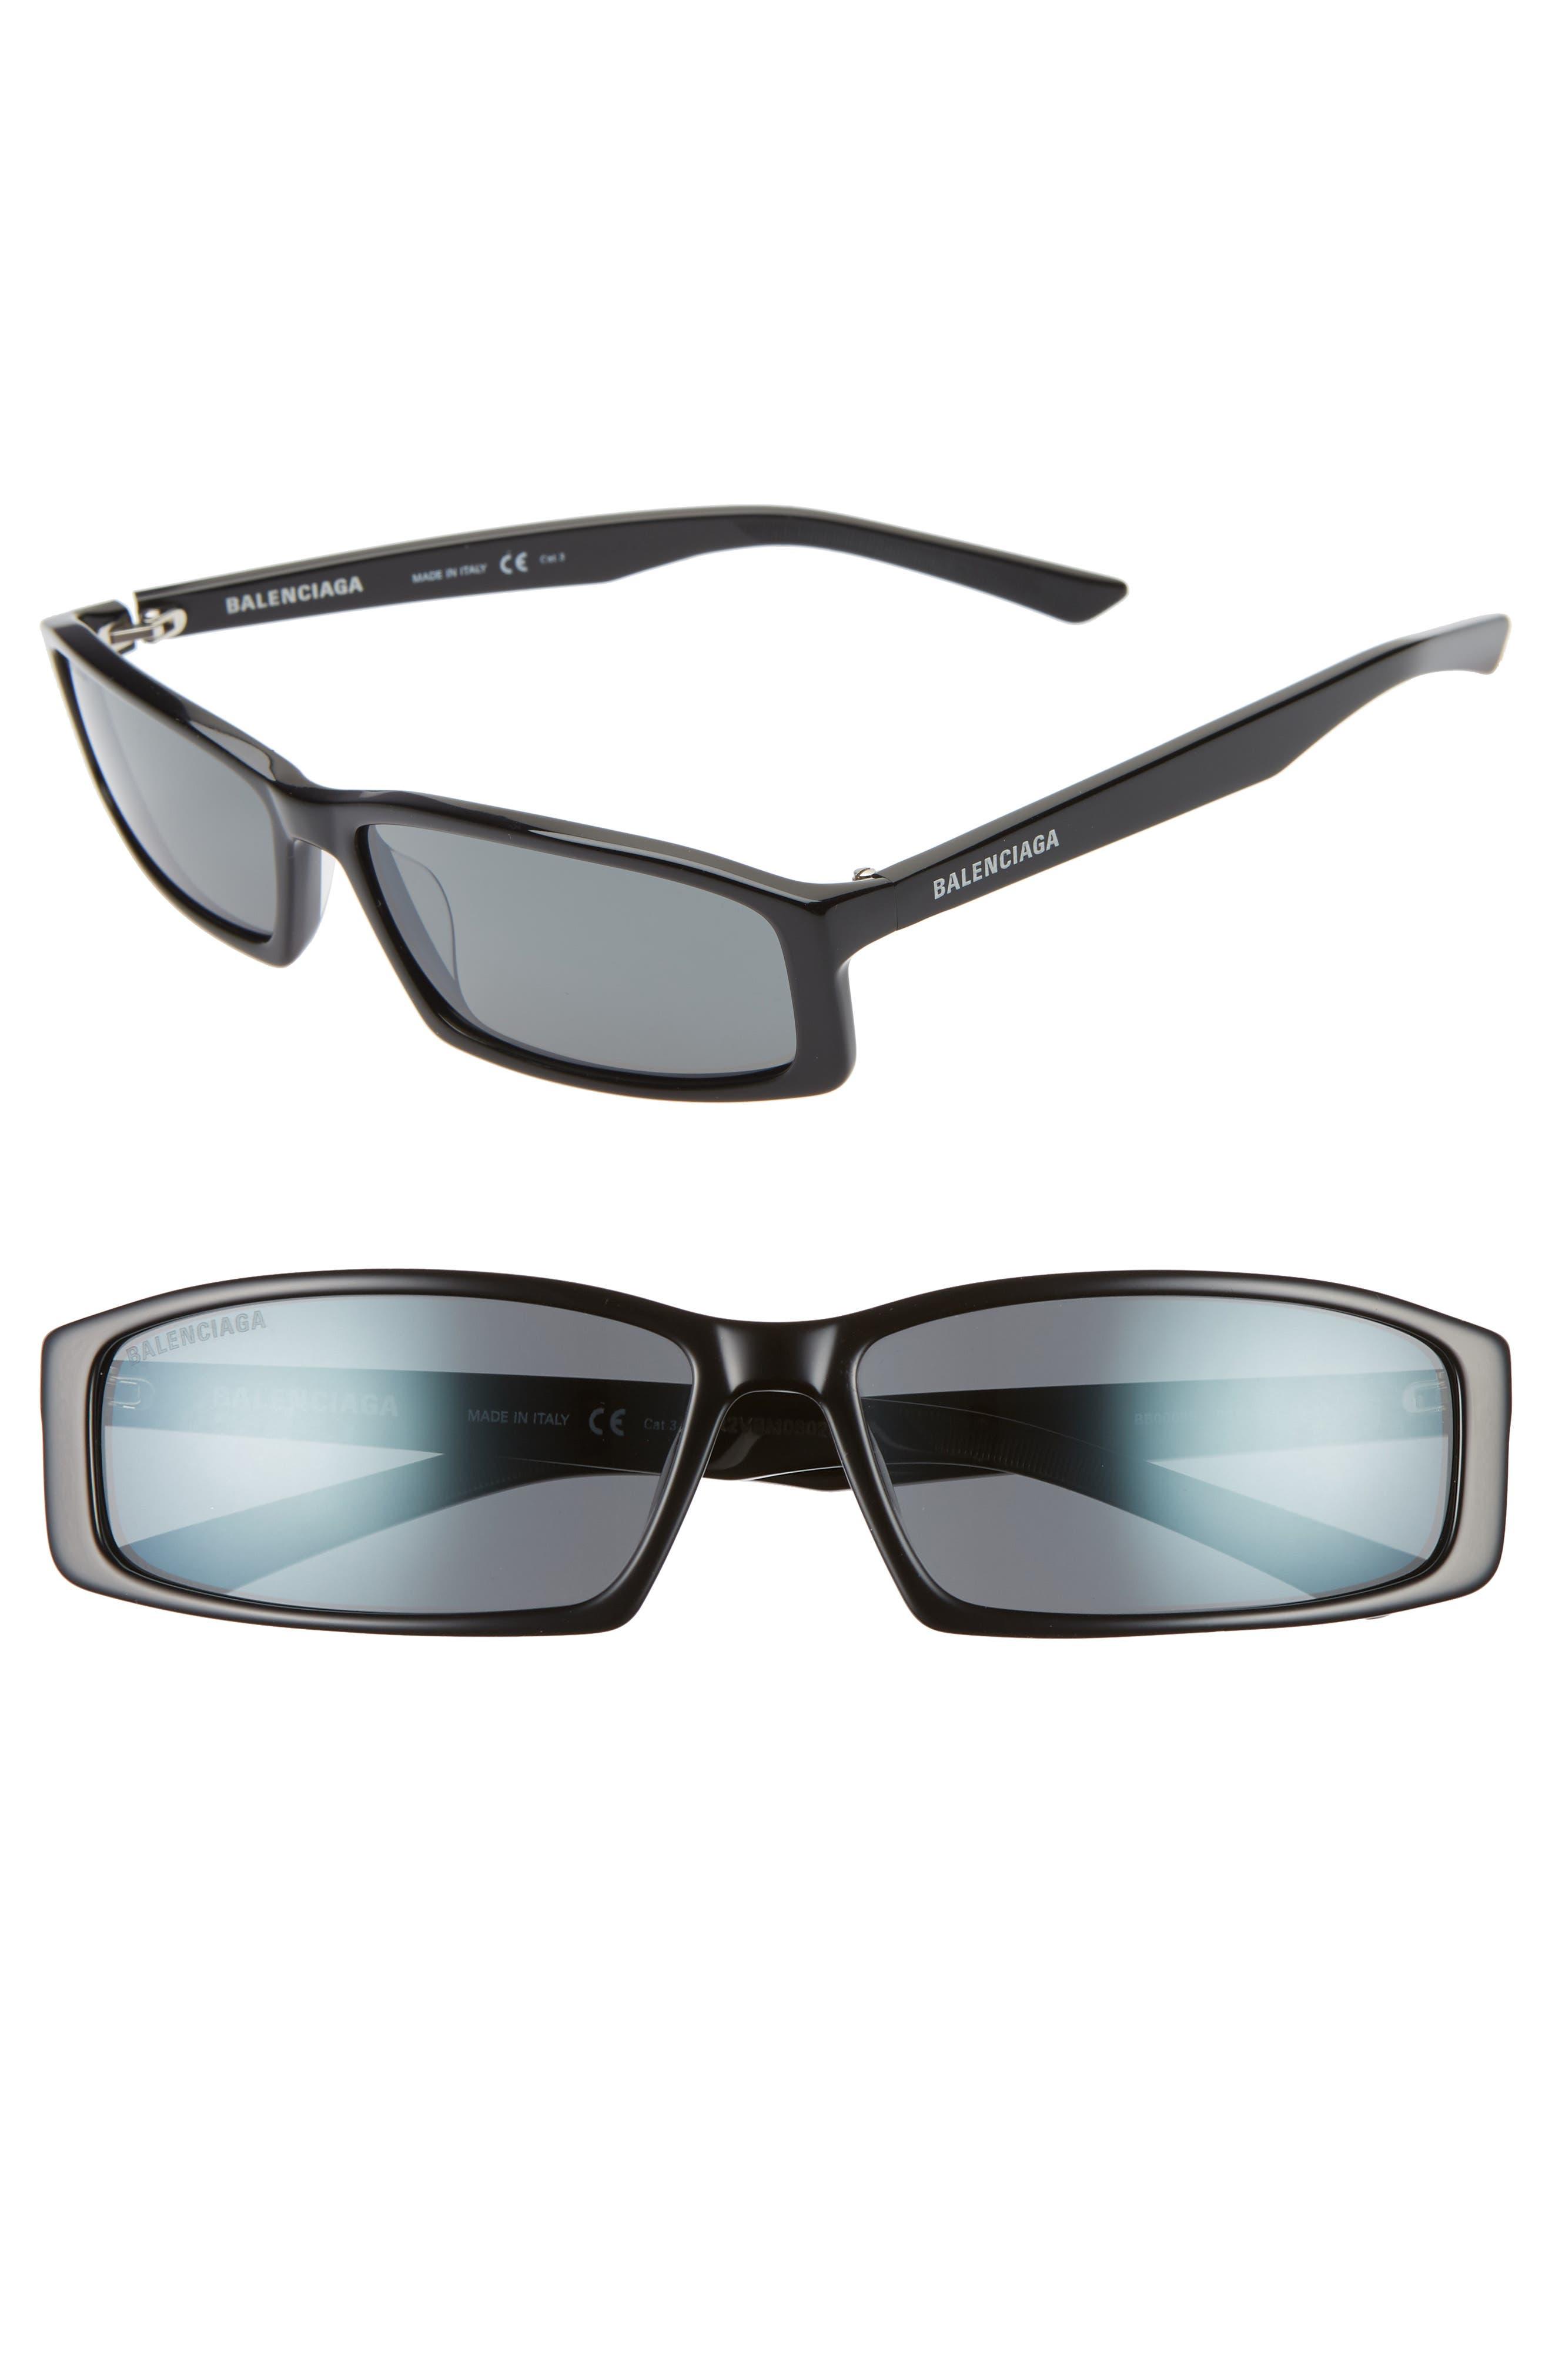 BALENCIAGA, 60mm Rectangle Sunglasses, Main thumbnail 1, color, SHINY BLACK/ GREY